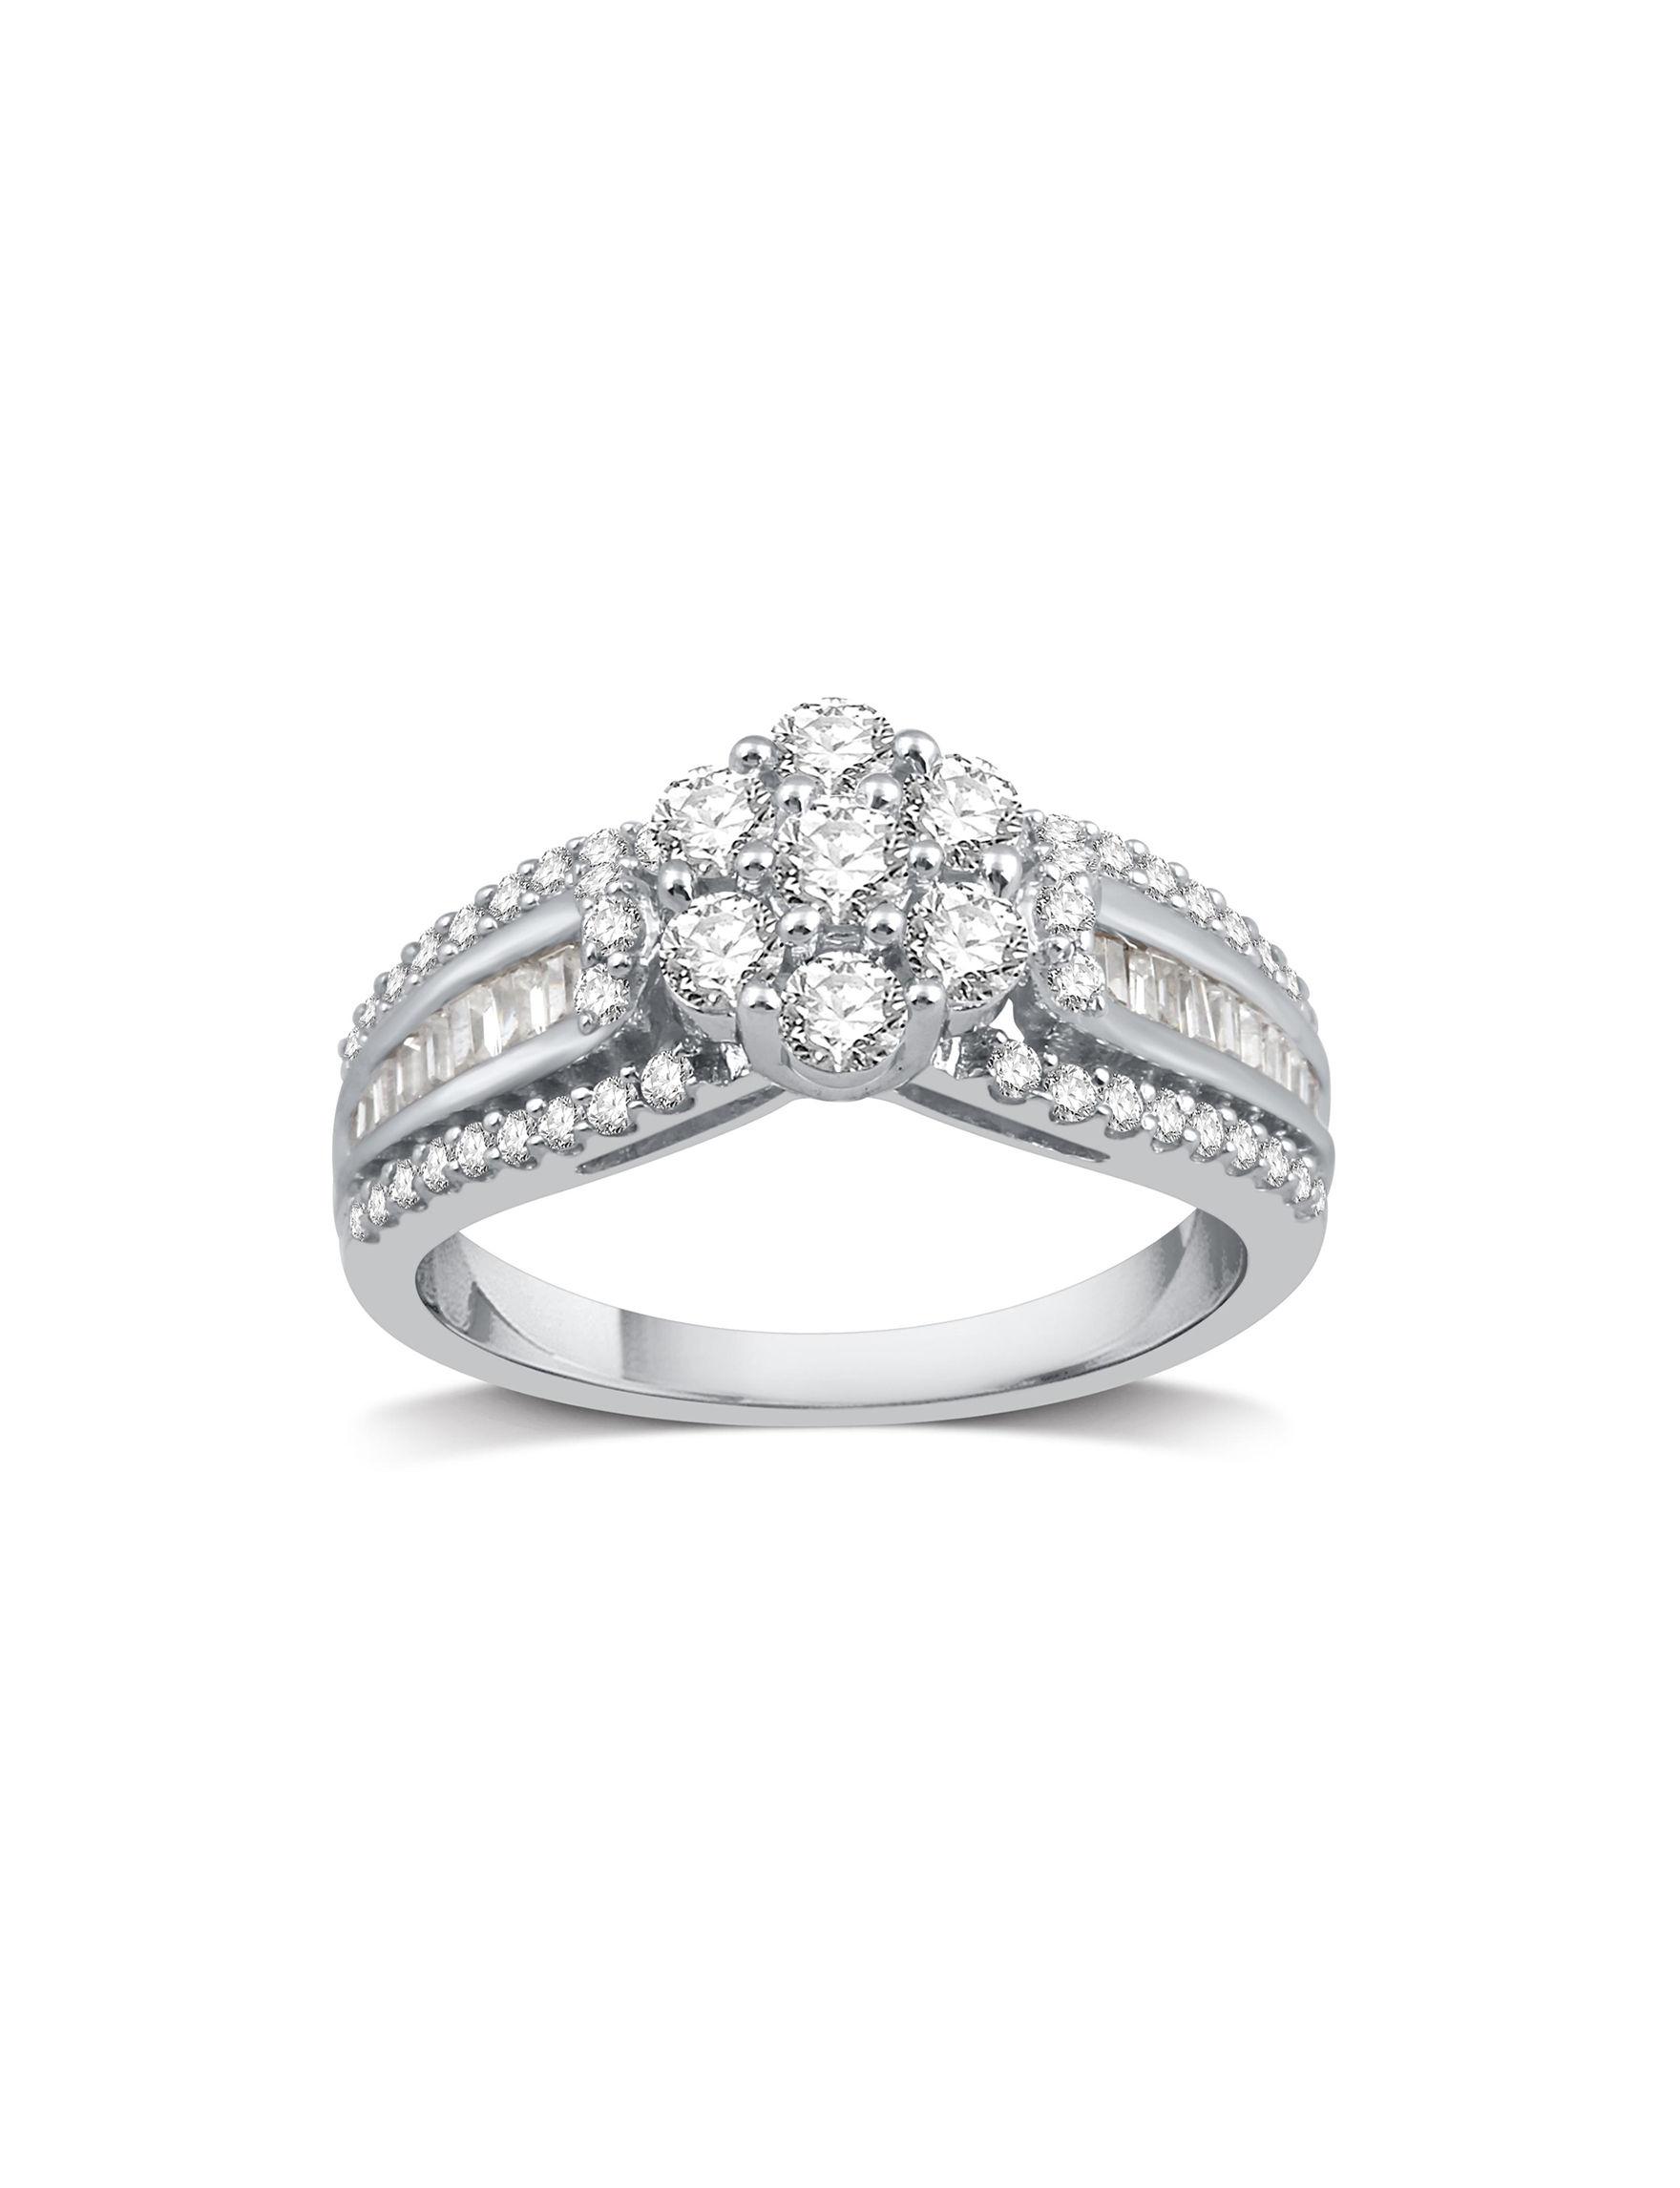 DeCarat Silver Rings Fine Jewelry